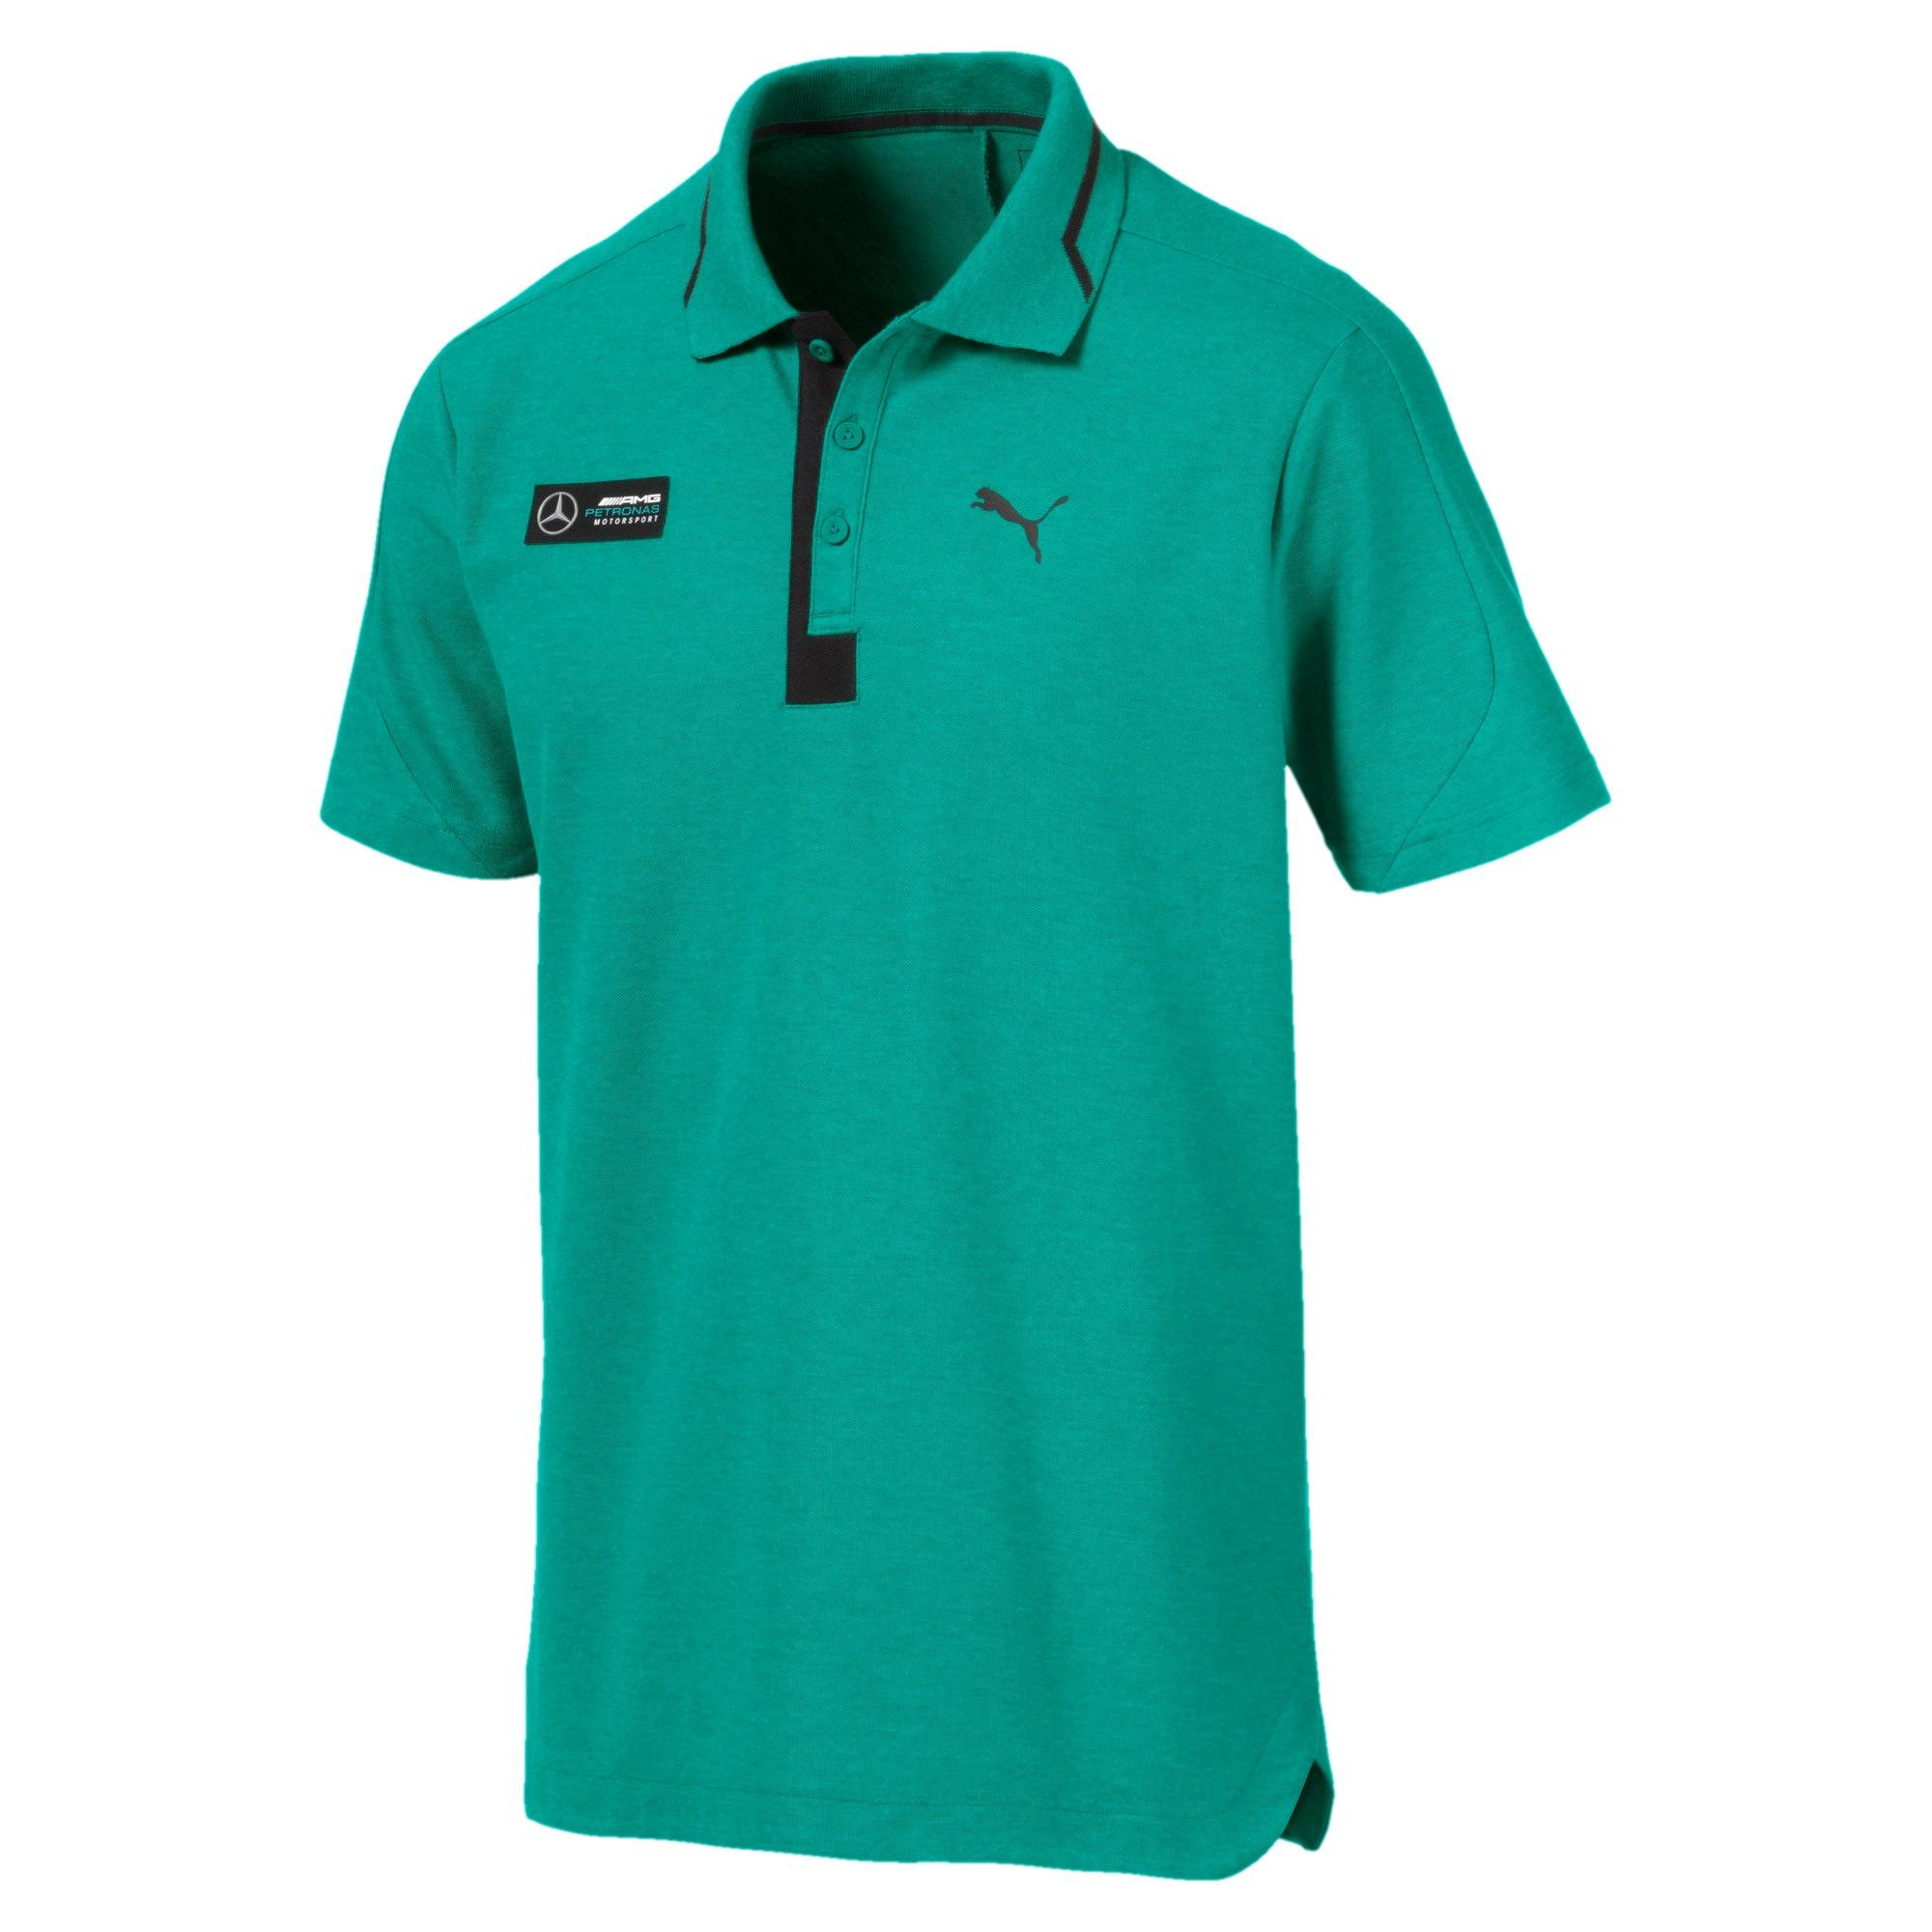 Thumbnail 4 of Mercedes AMG Petronas Men's Polo Shirt, Spectra Green Heather, medium